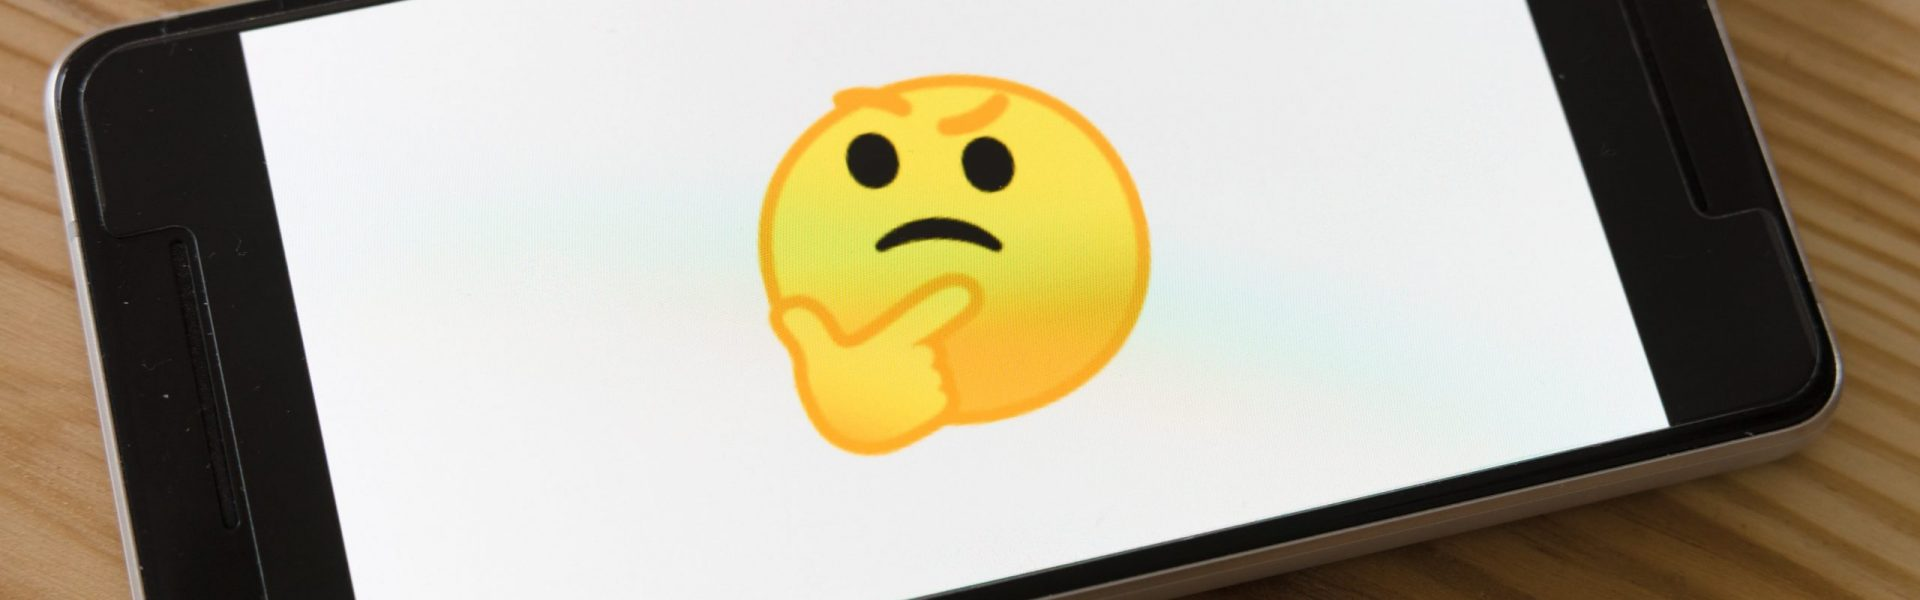 Emoji dubitative